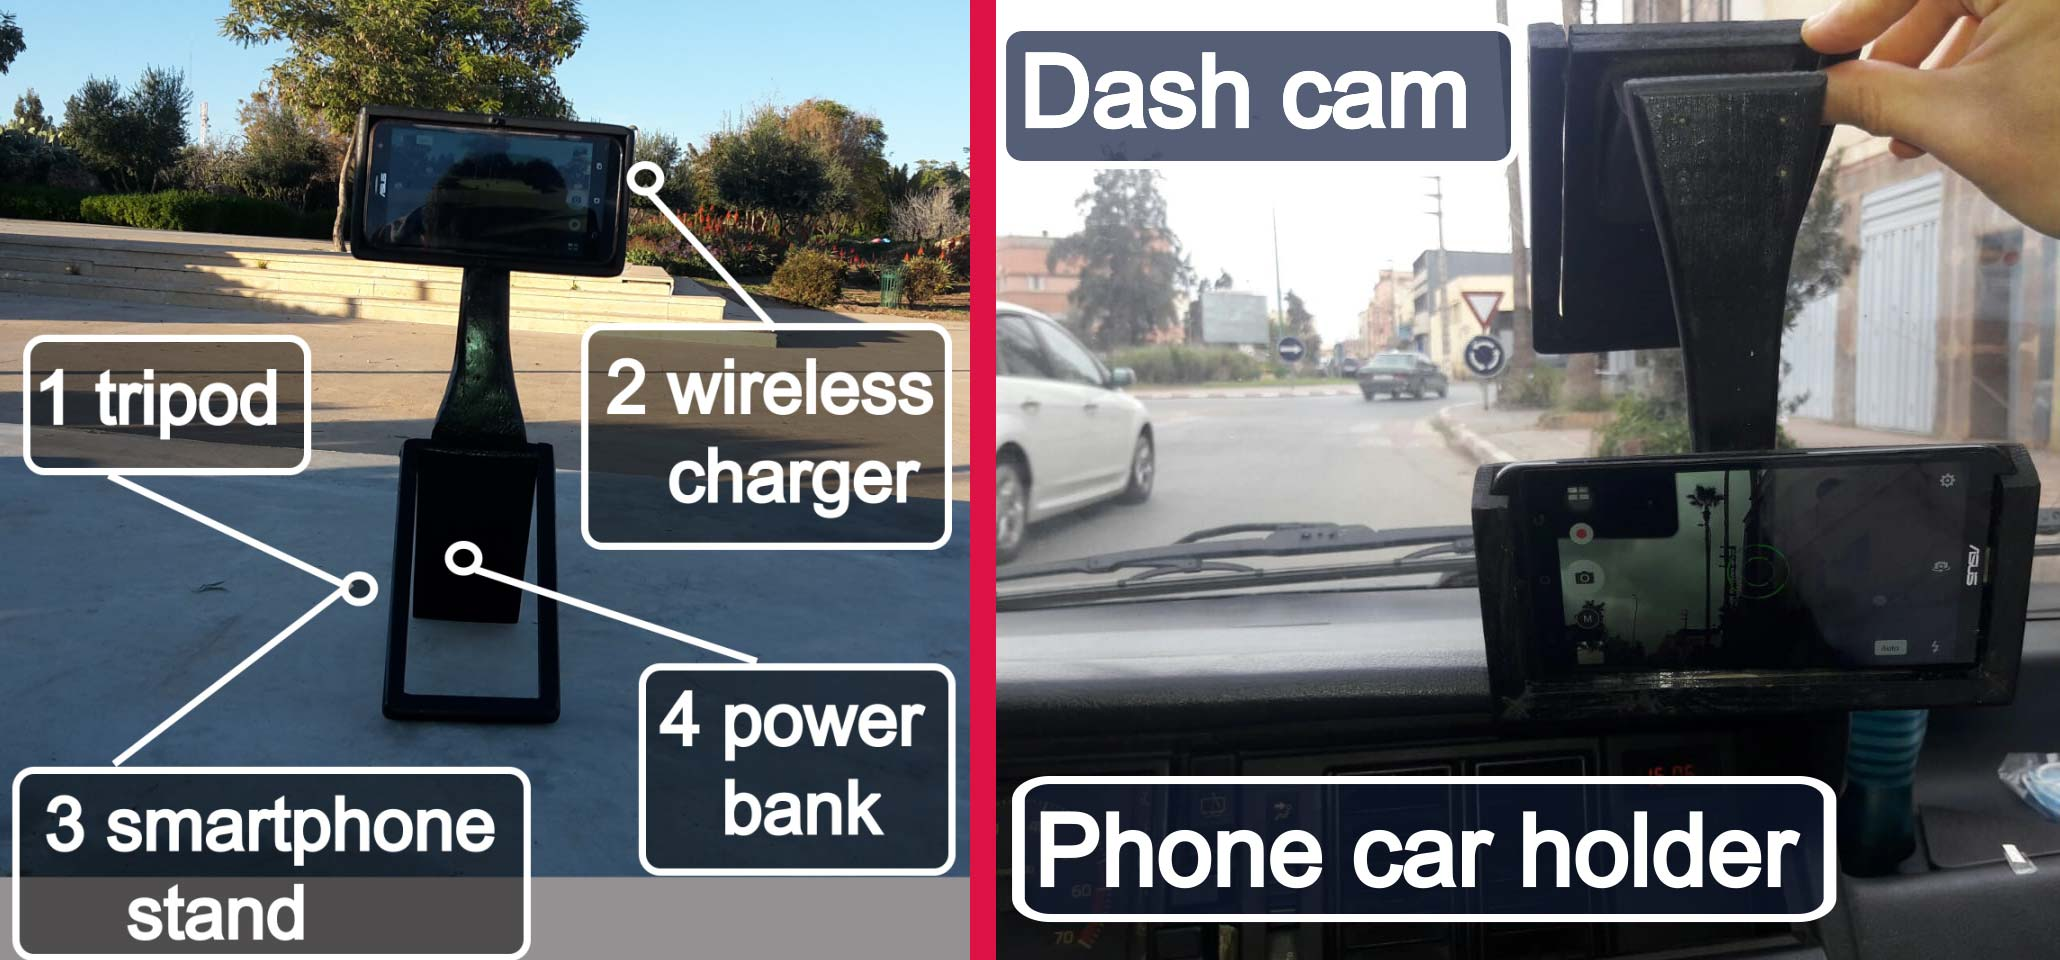 unismart-as-in-car-dash-cam-and-car-phone-holder